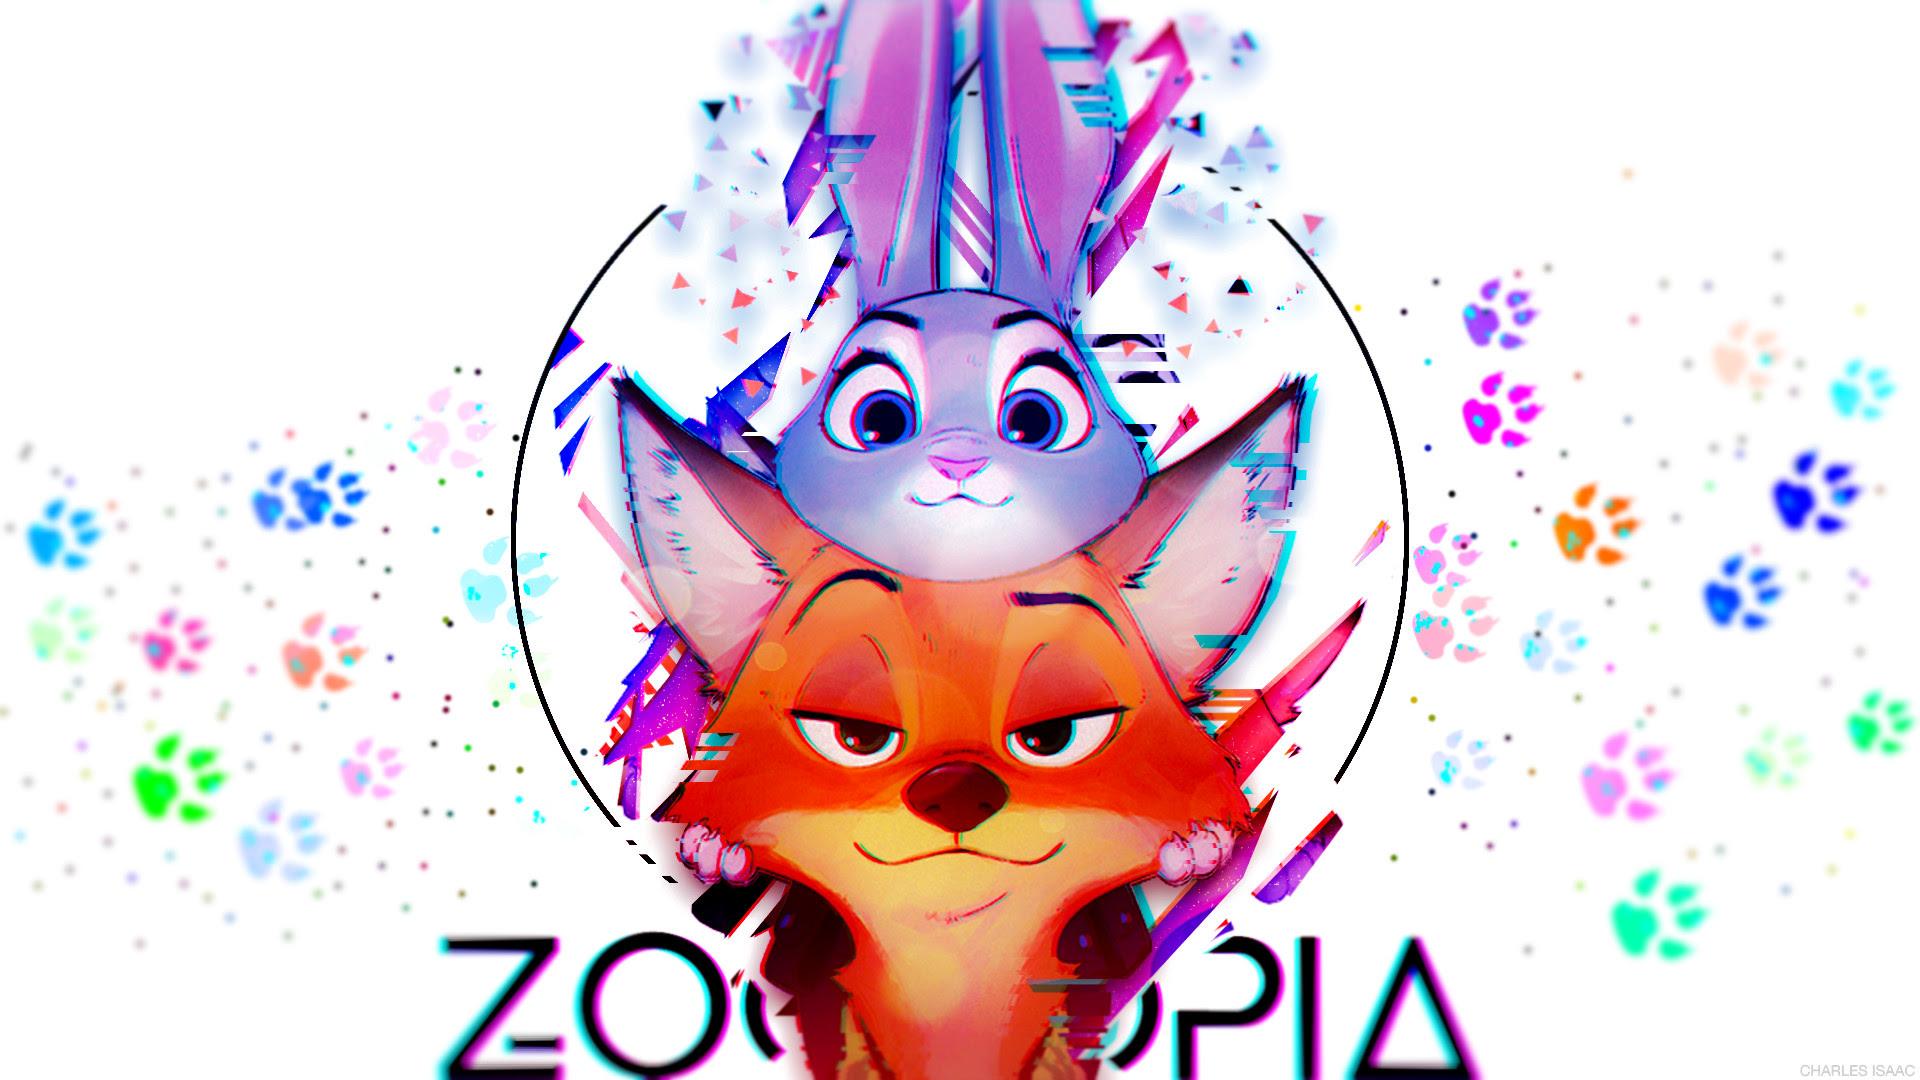 Zootopia Iphone Wallpaper 73 Images